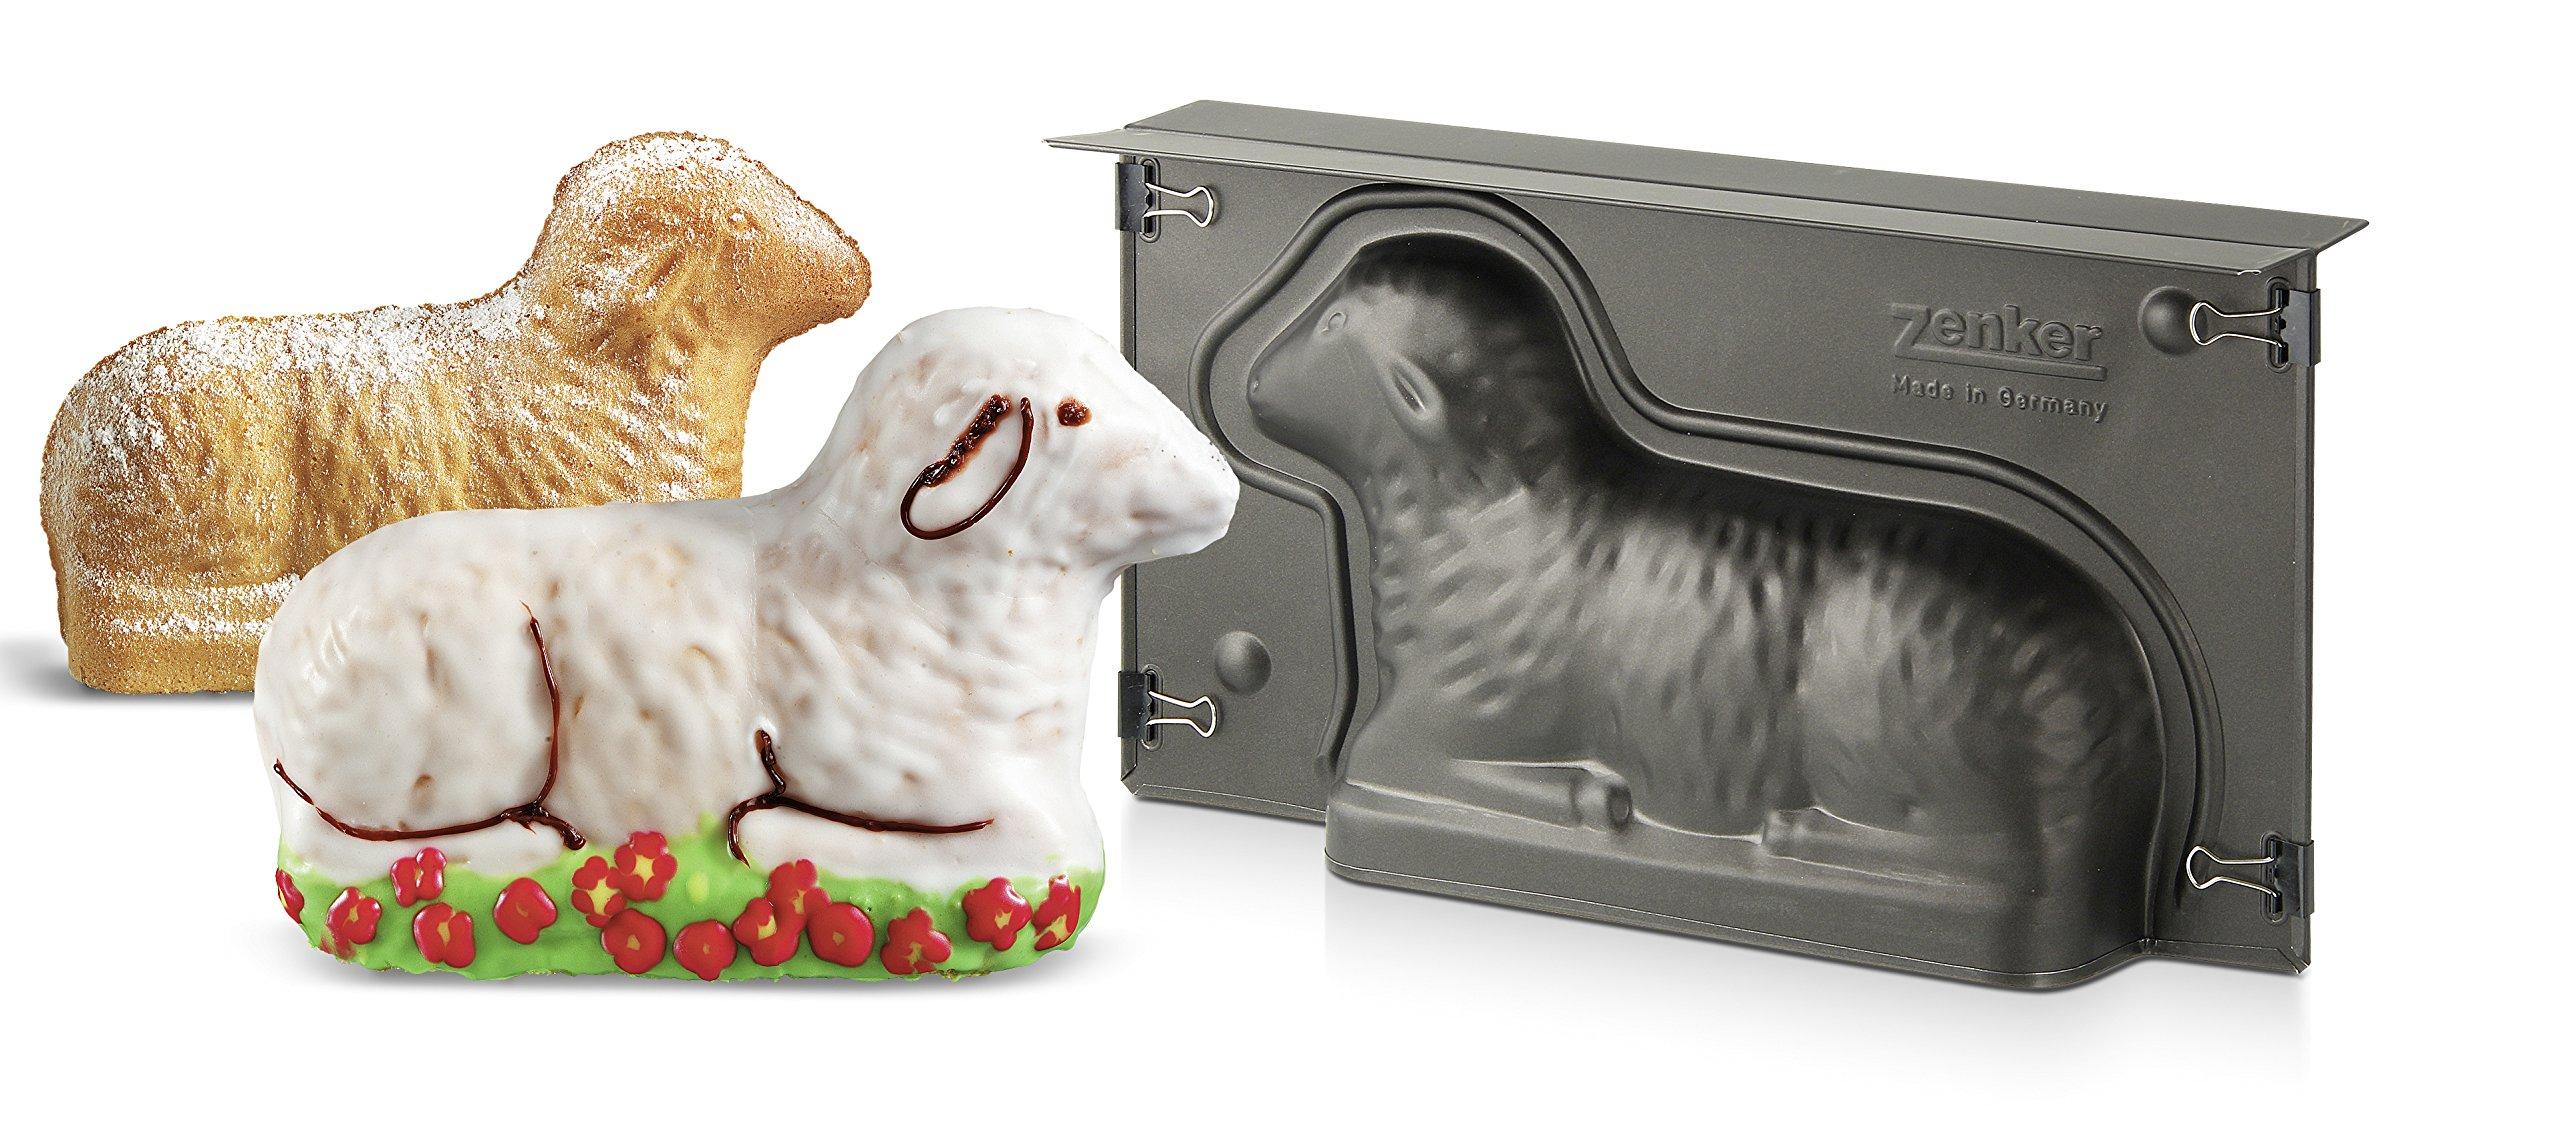 Zenker 9101''Special Season'' Lamb-Baking Tin, Black, 10.83 x 5.90 x 2.56'' by Zenker (Image #2)